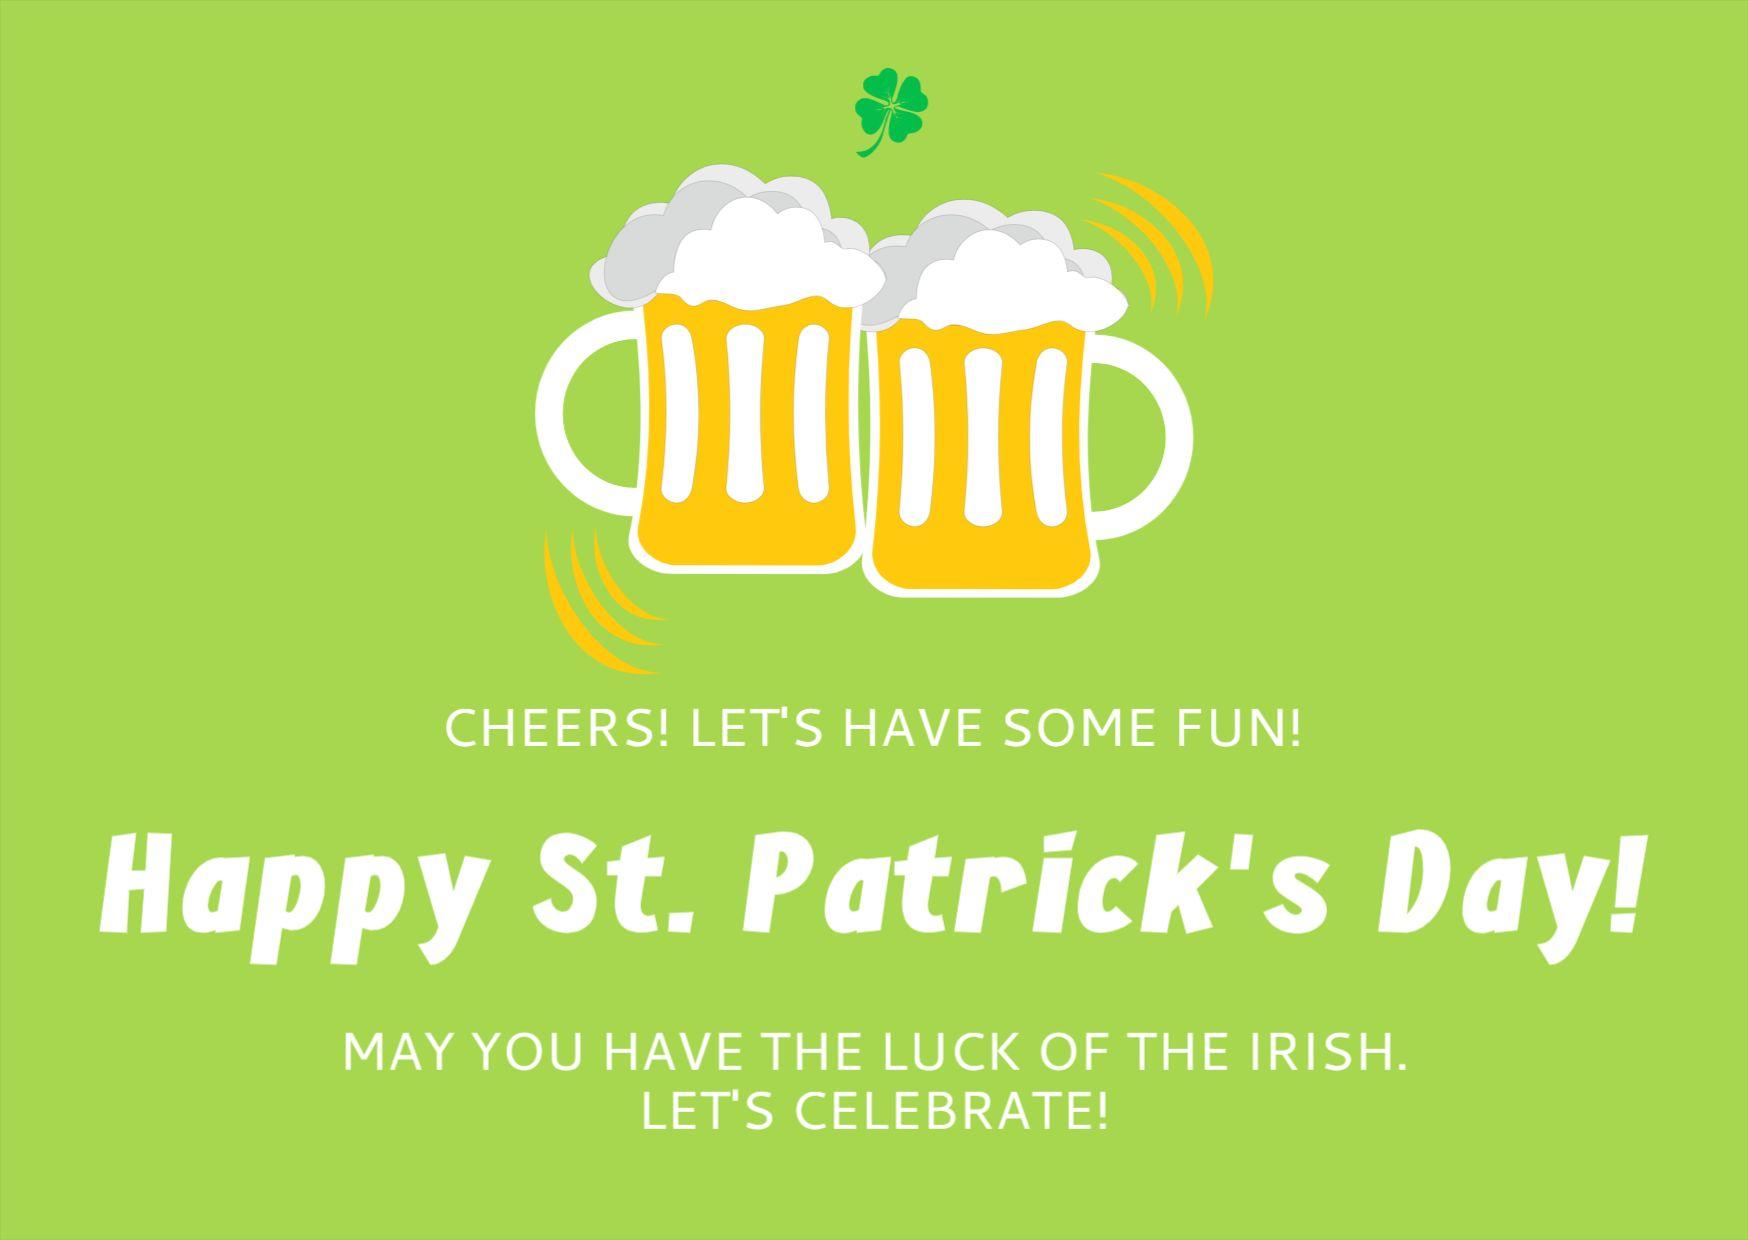 St Patricks Day Celebration Greetings Template